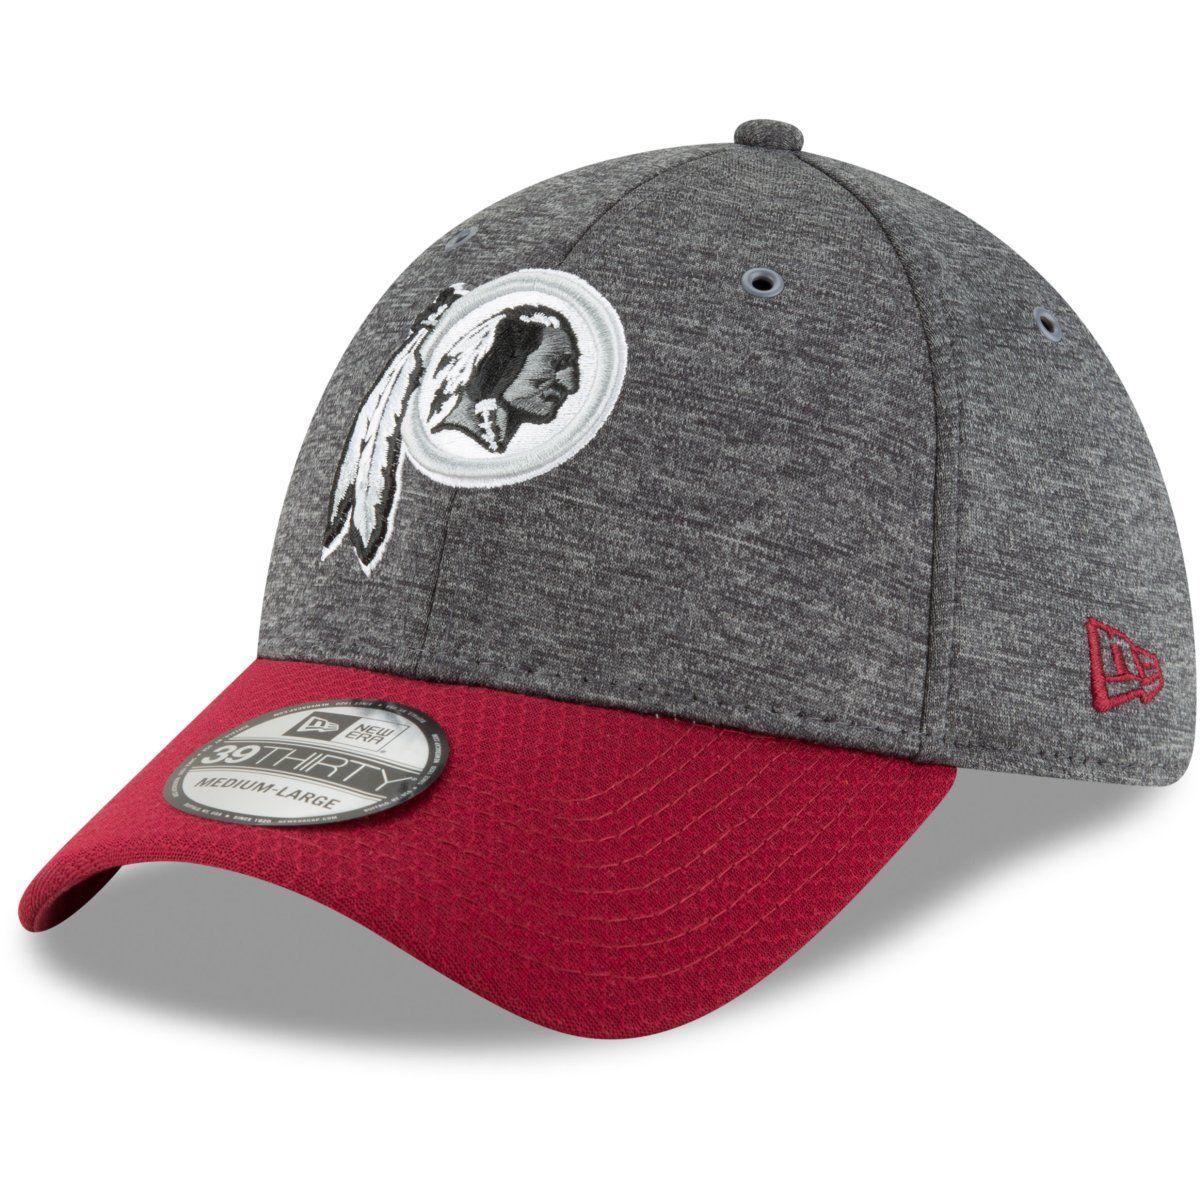 amfoo - New Era 39Thirty Cap - Sideline Graphite Washington Redskins